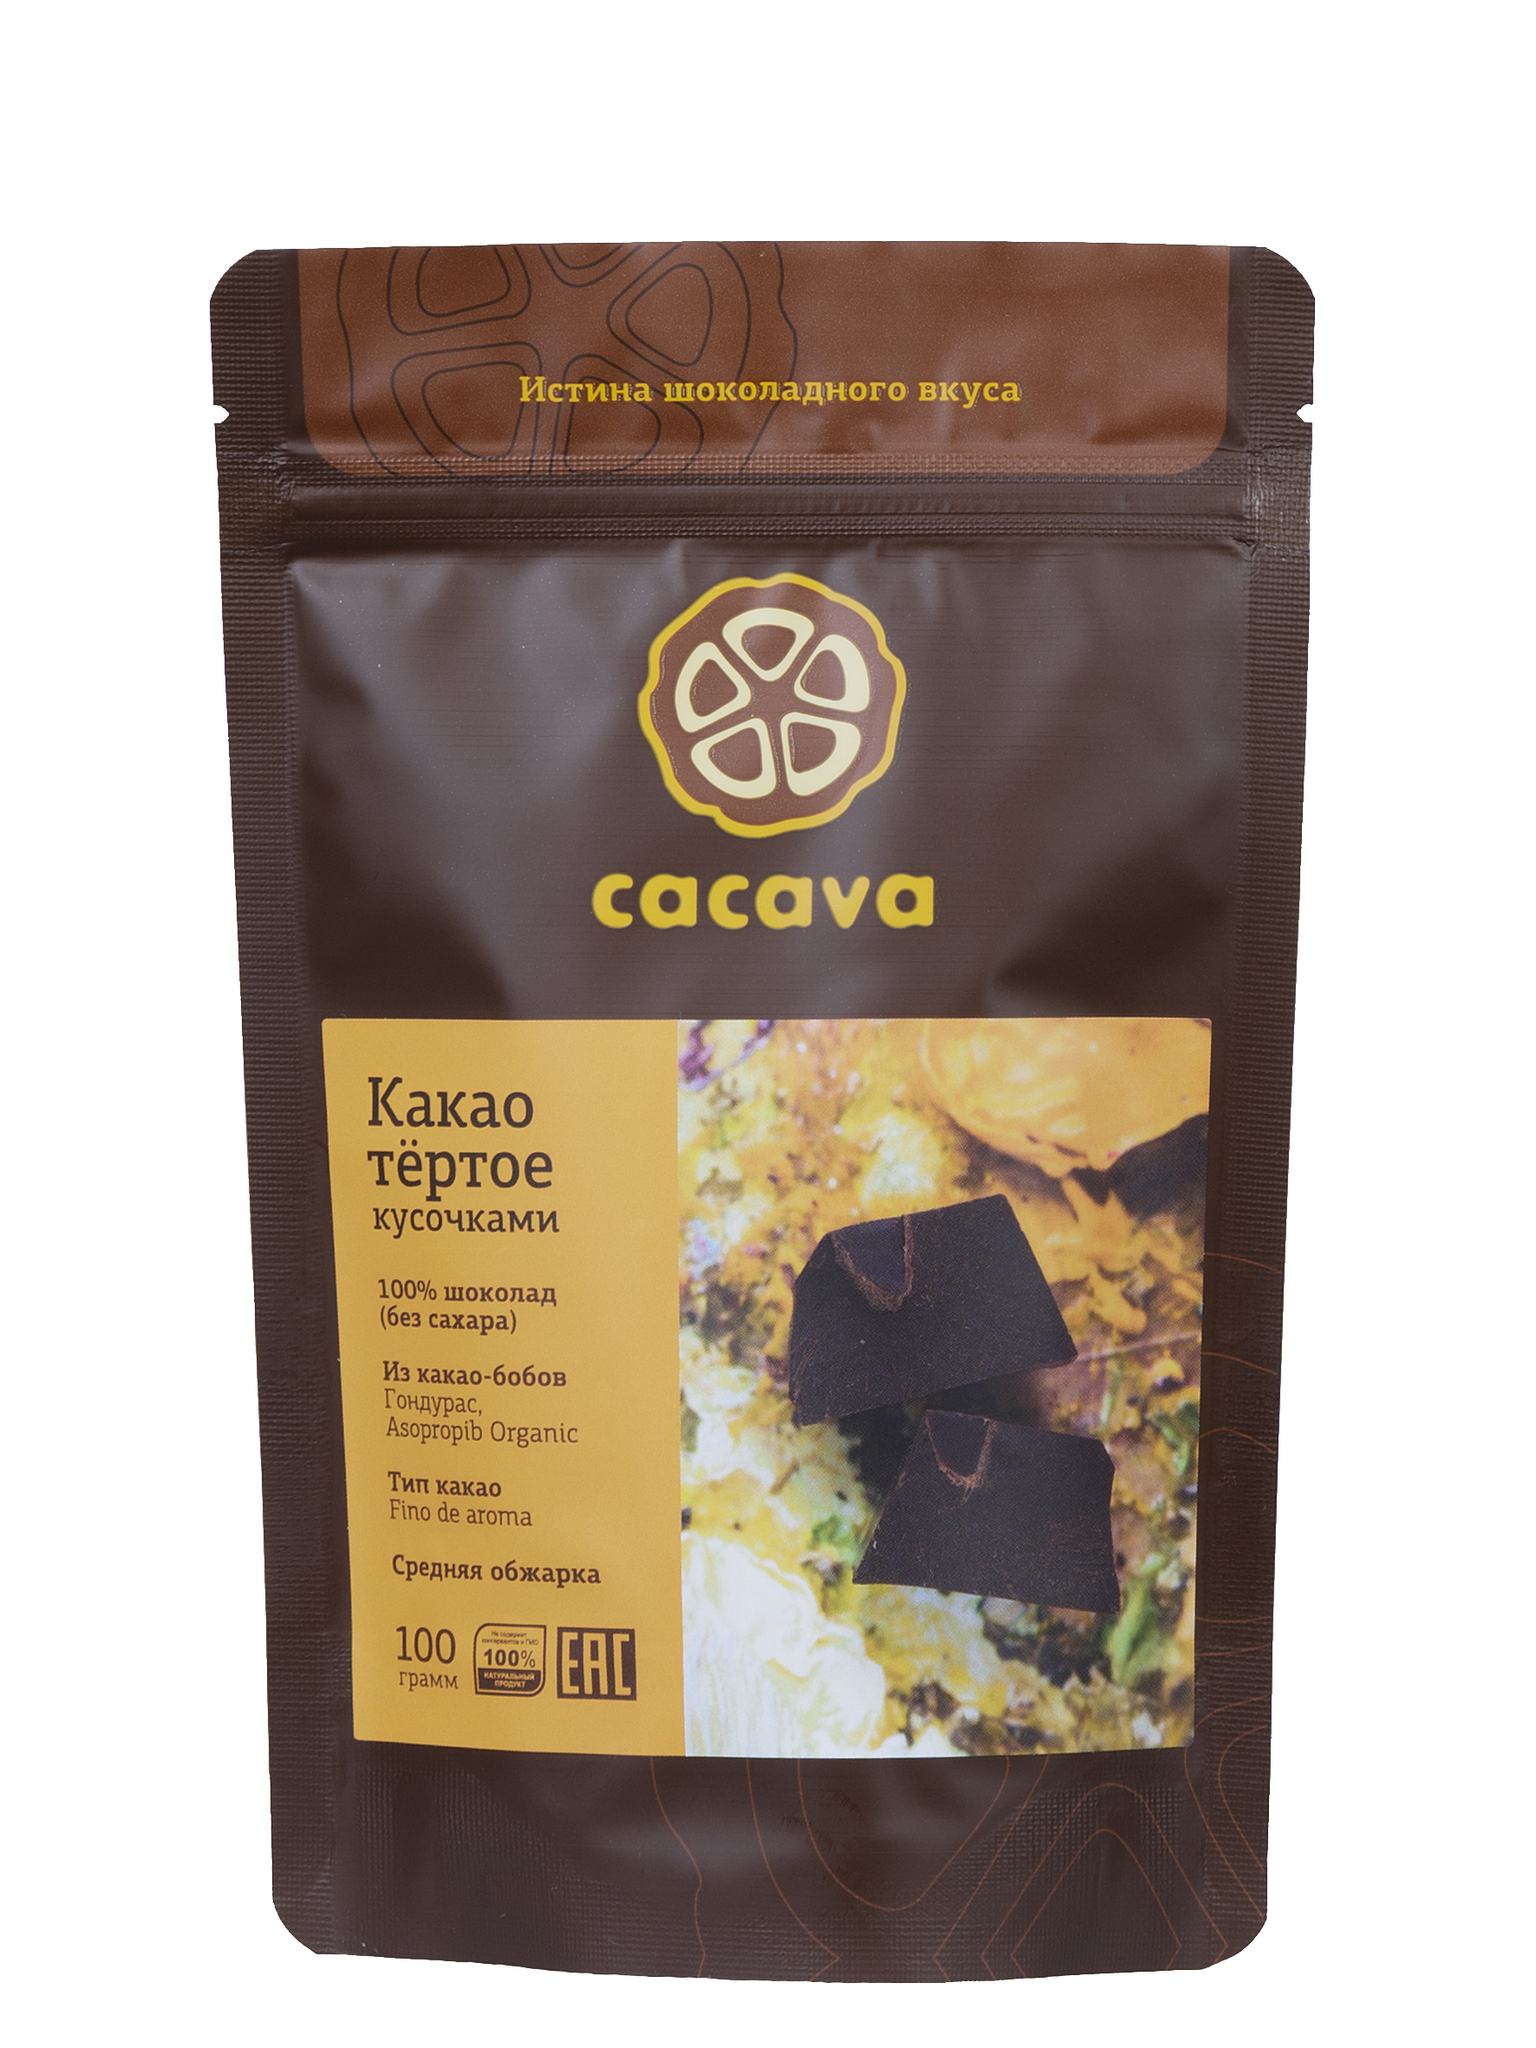 Какао тёртое кусочками (Гондурас, Asopropib), упаковка 100 грамм